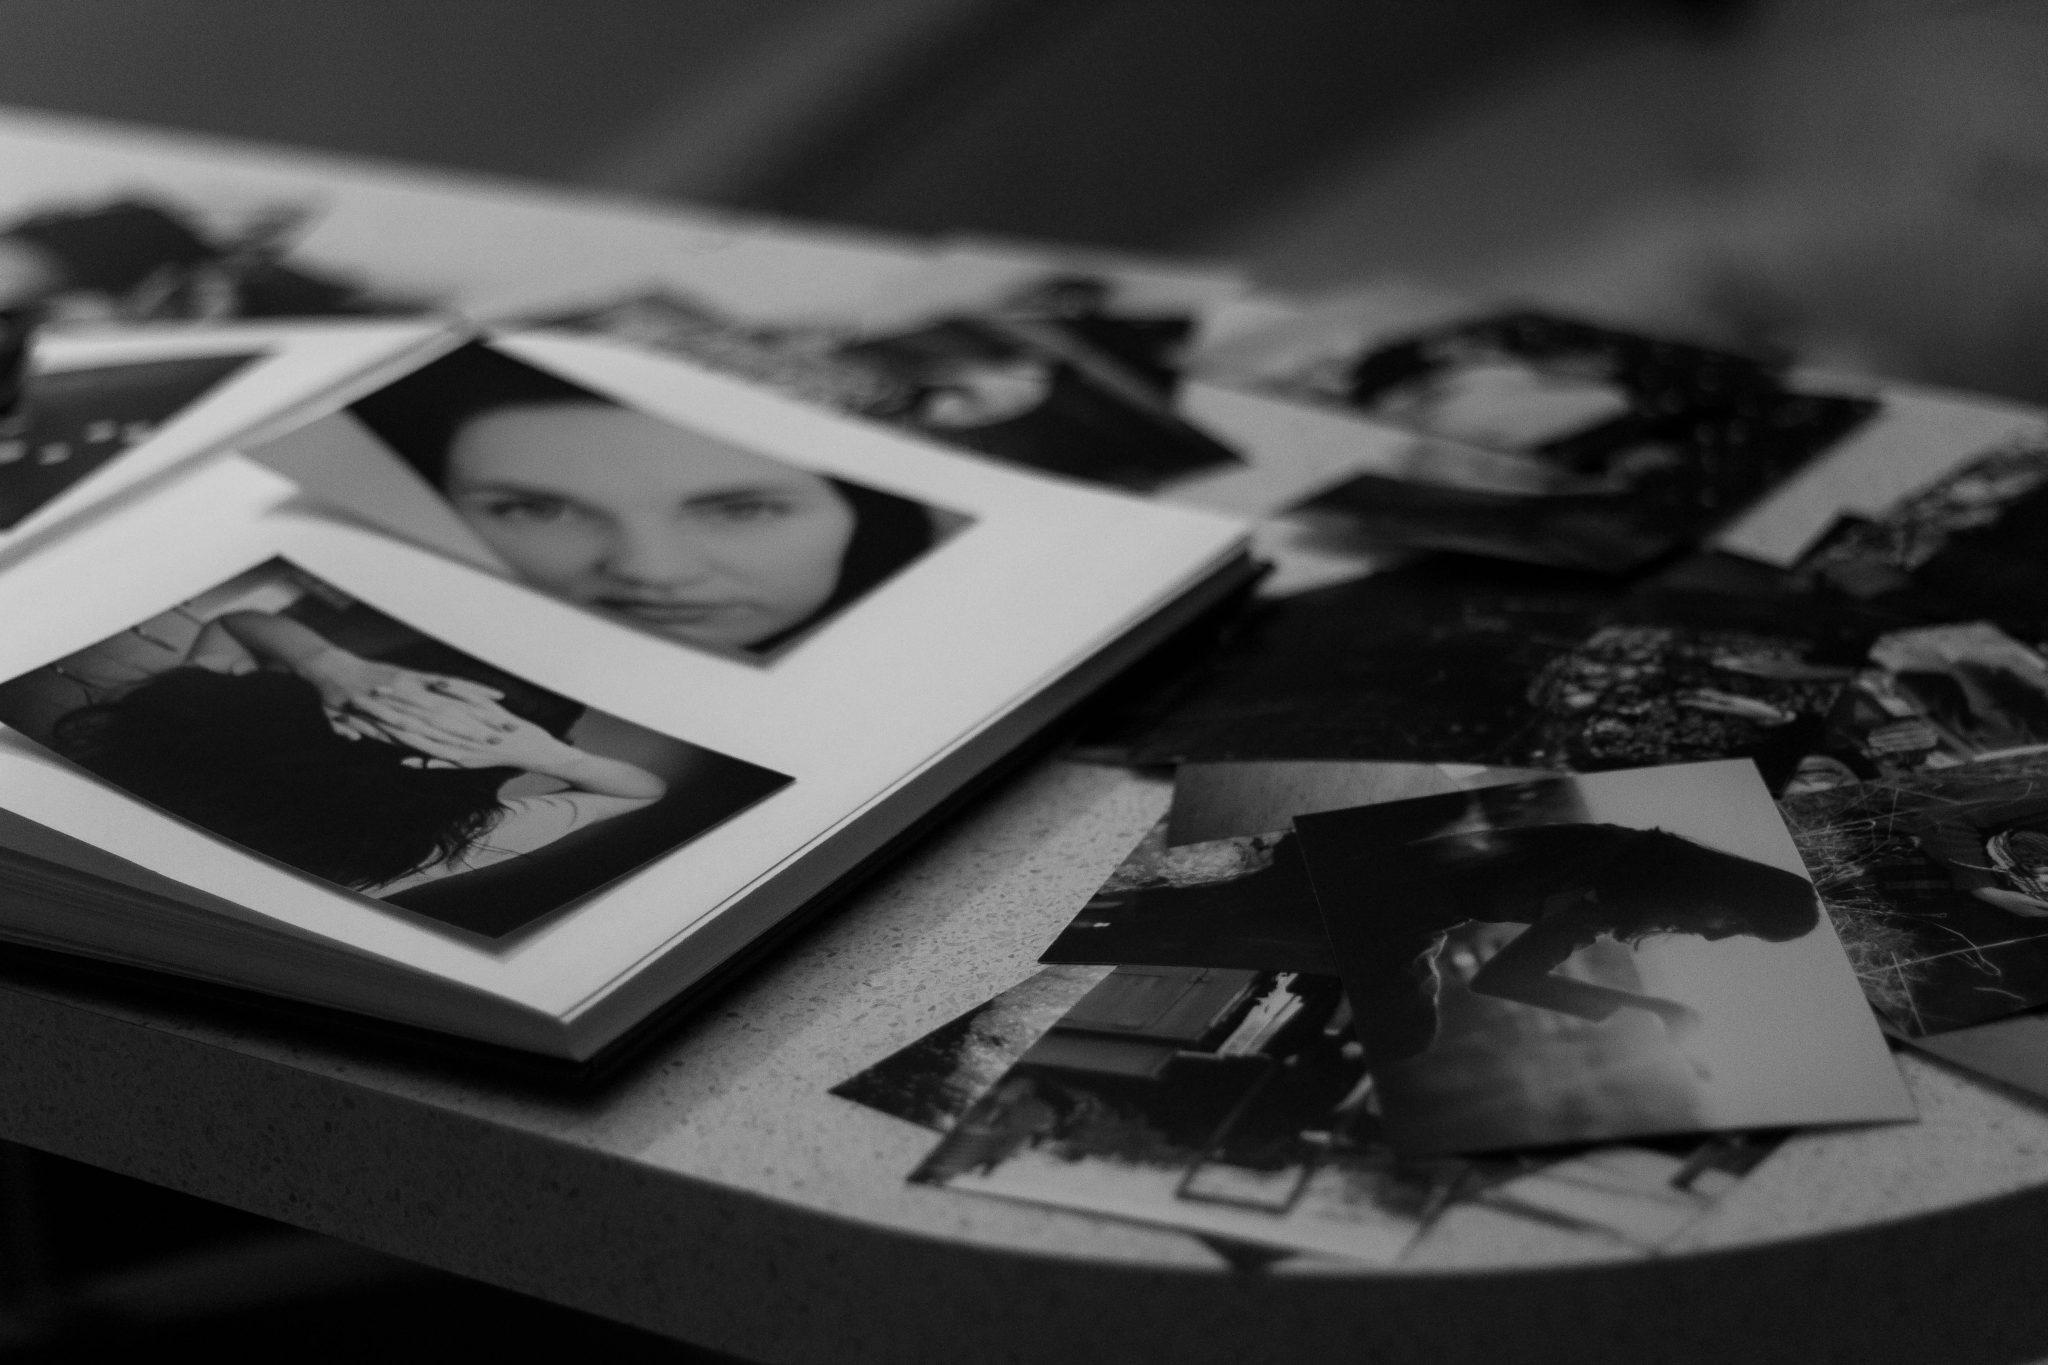 ernesto-album fotografici-fai da te